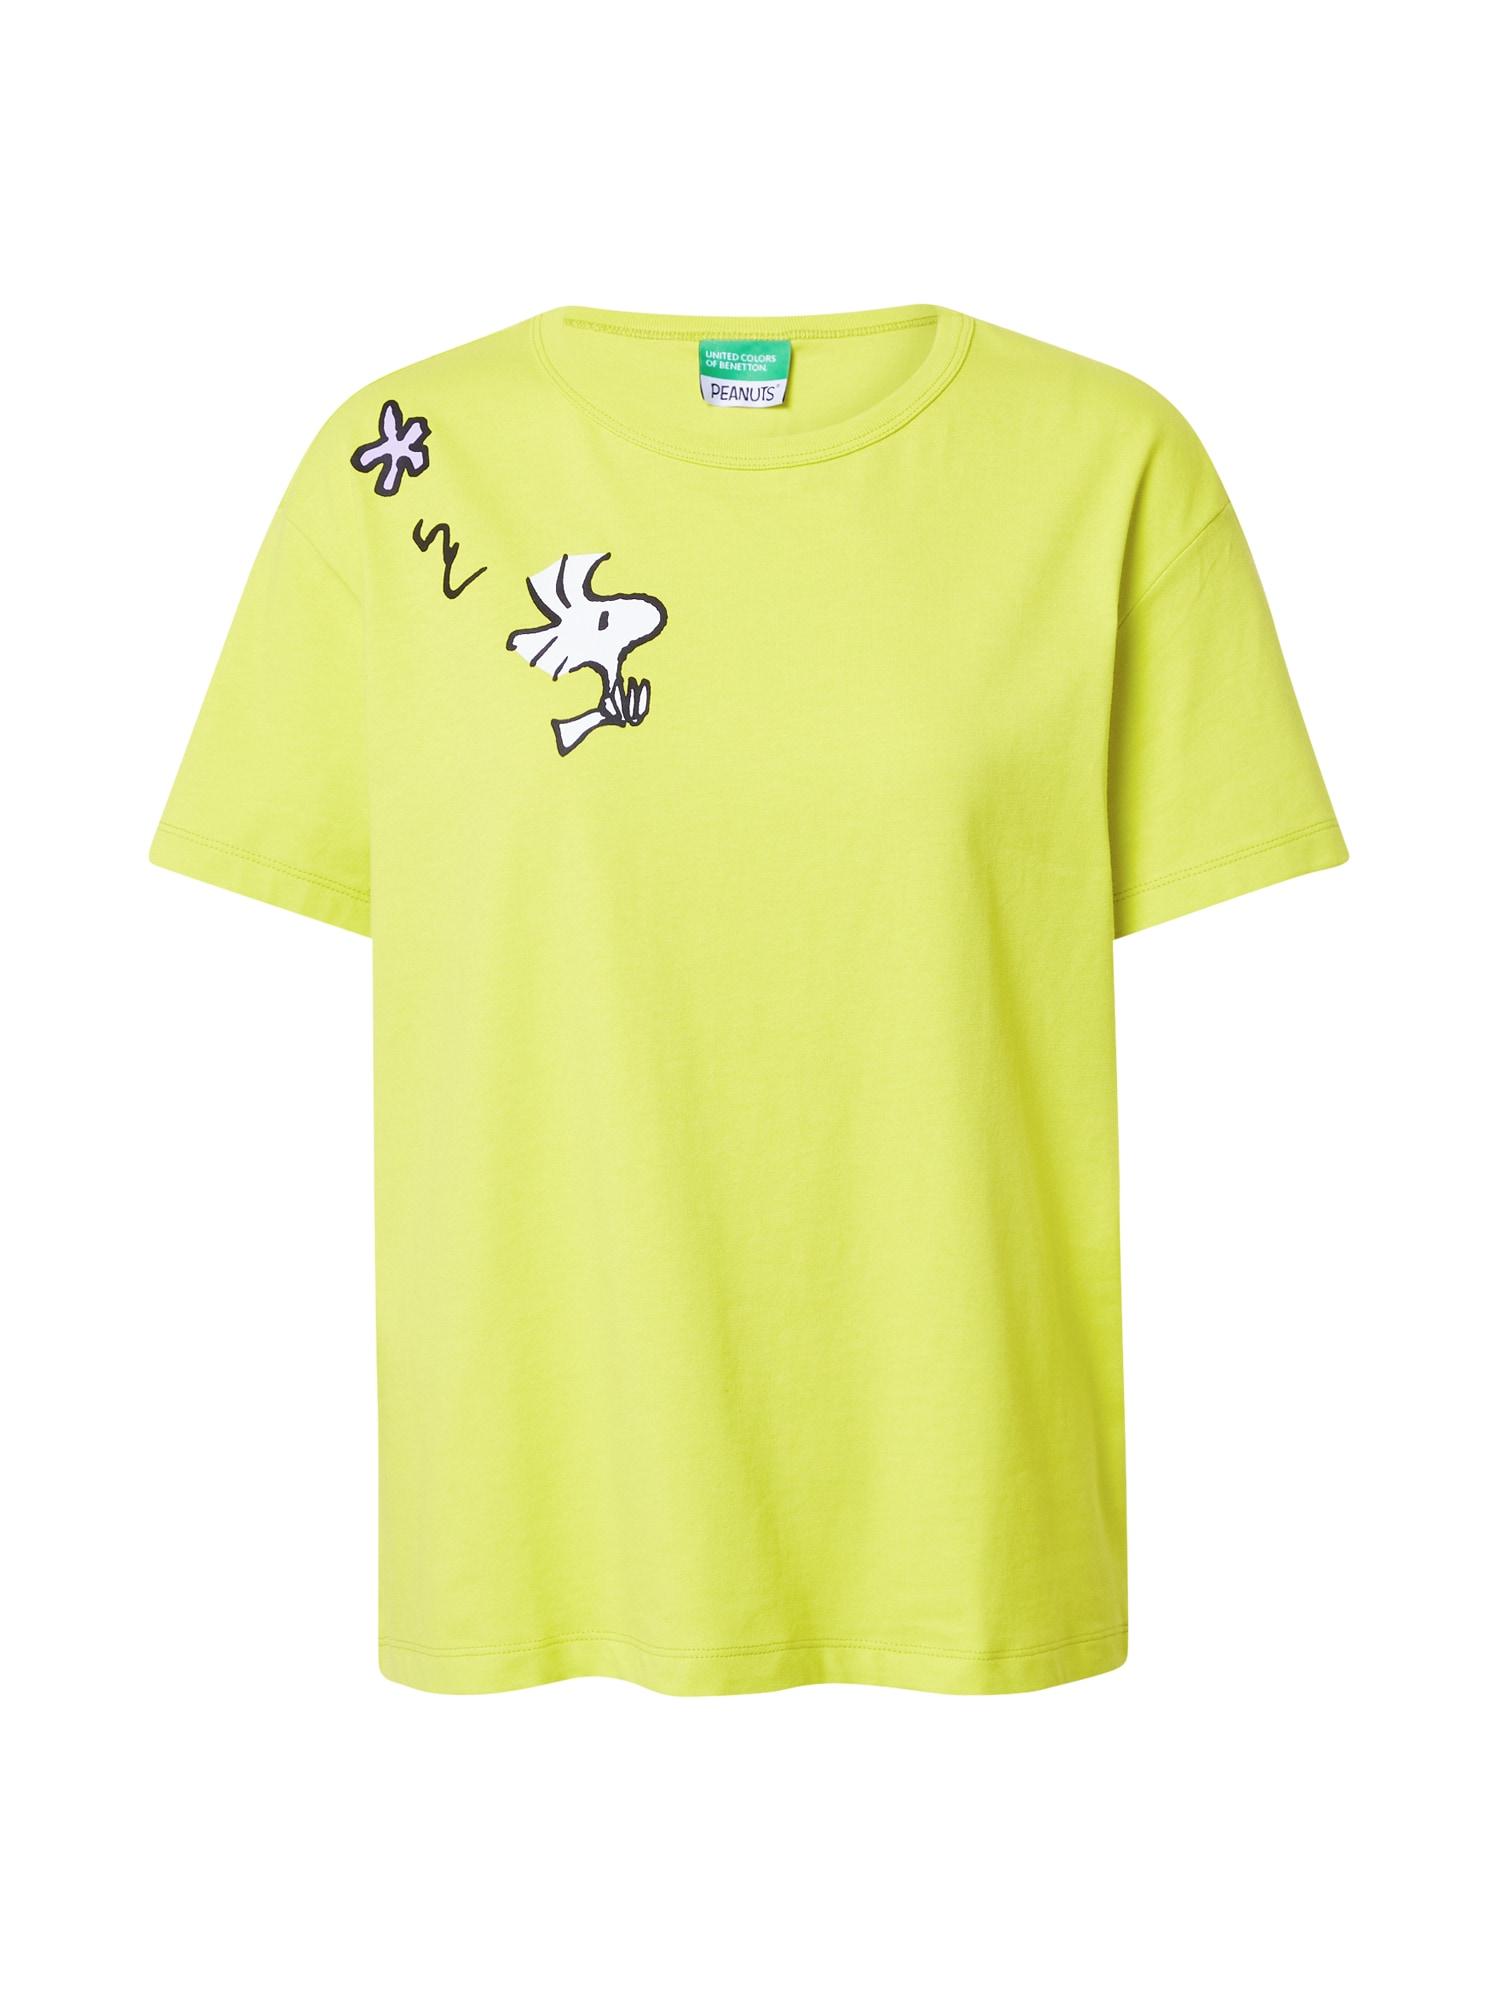 UNITED COLORS OF BENETTON Tričko  žlutá / bílá / černá